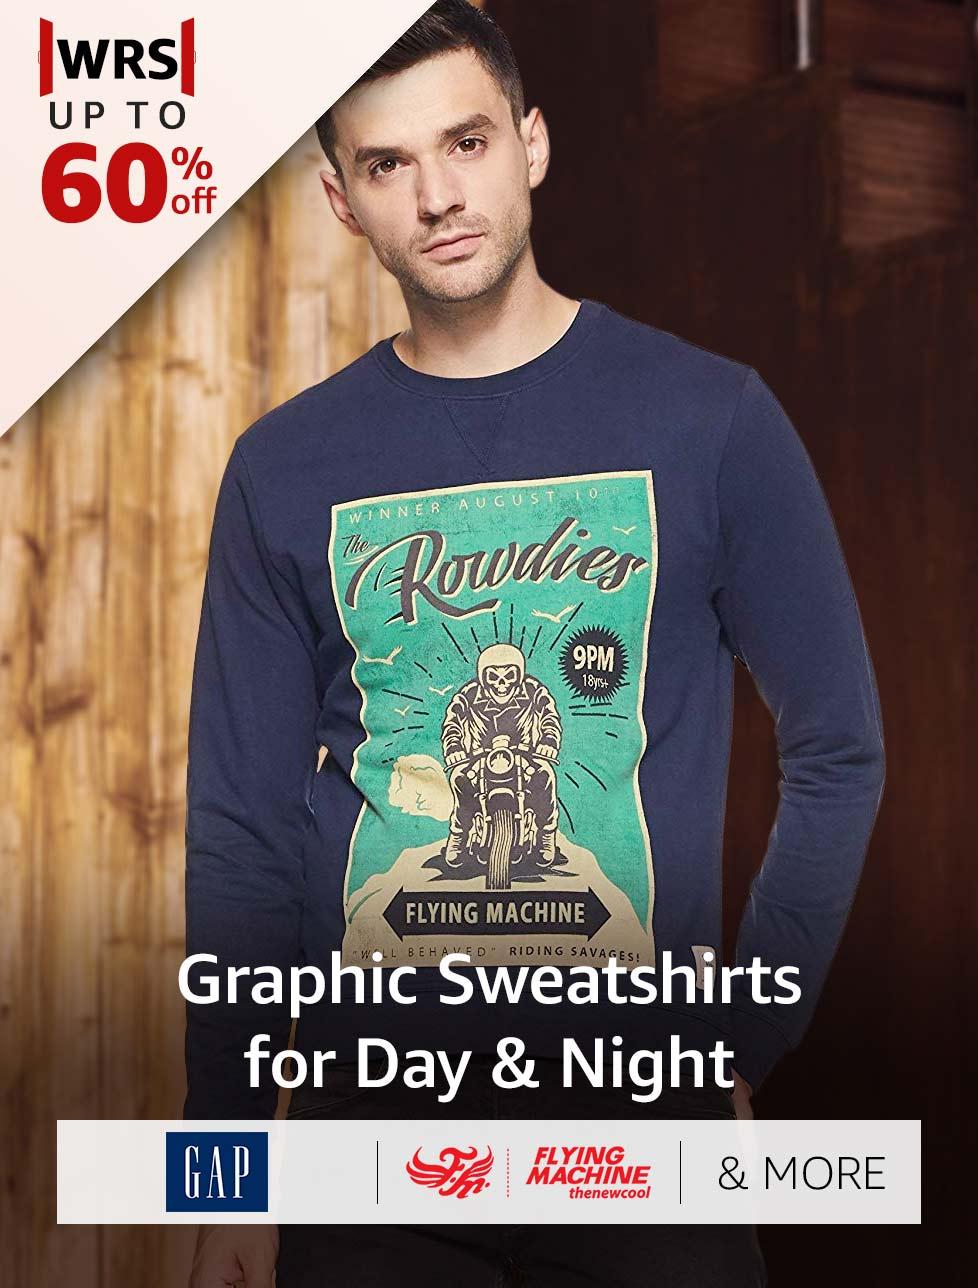 Graphics Sweatshirts